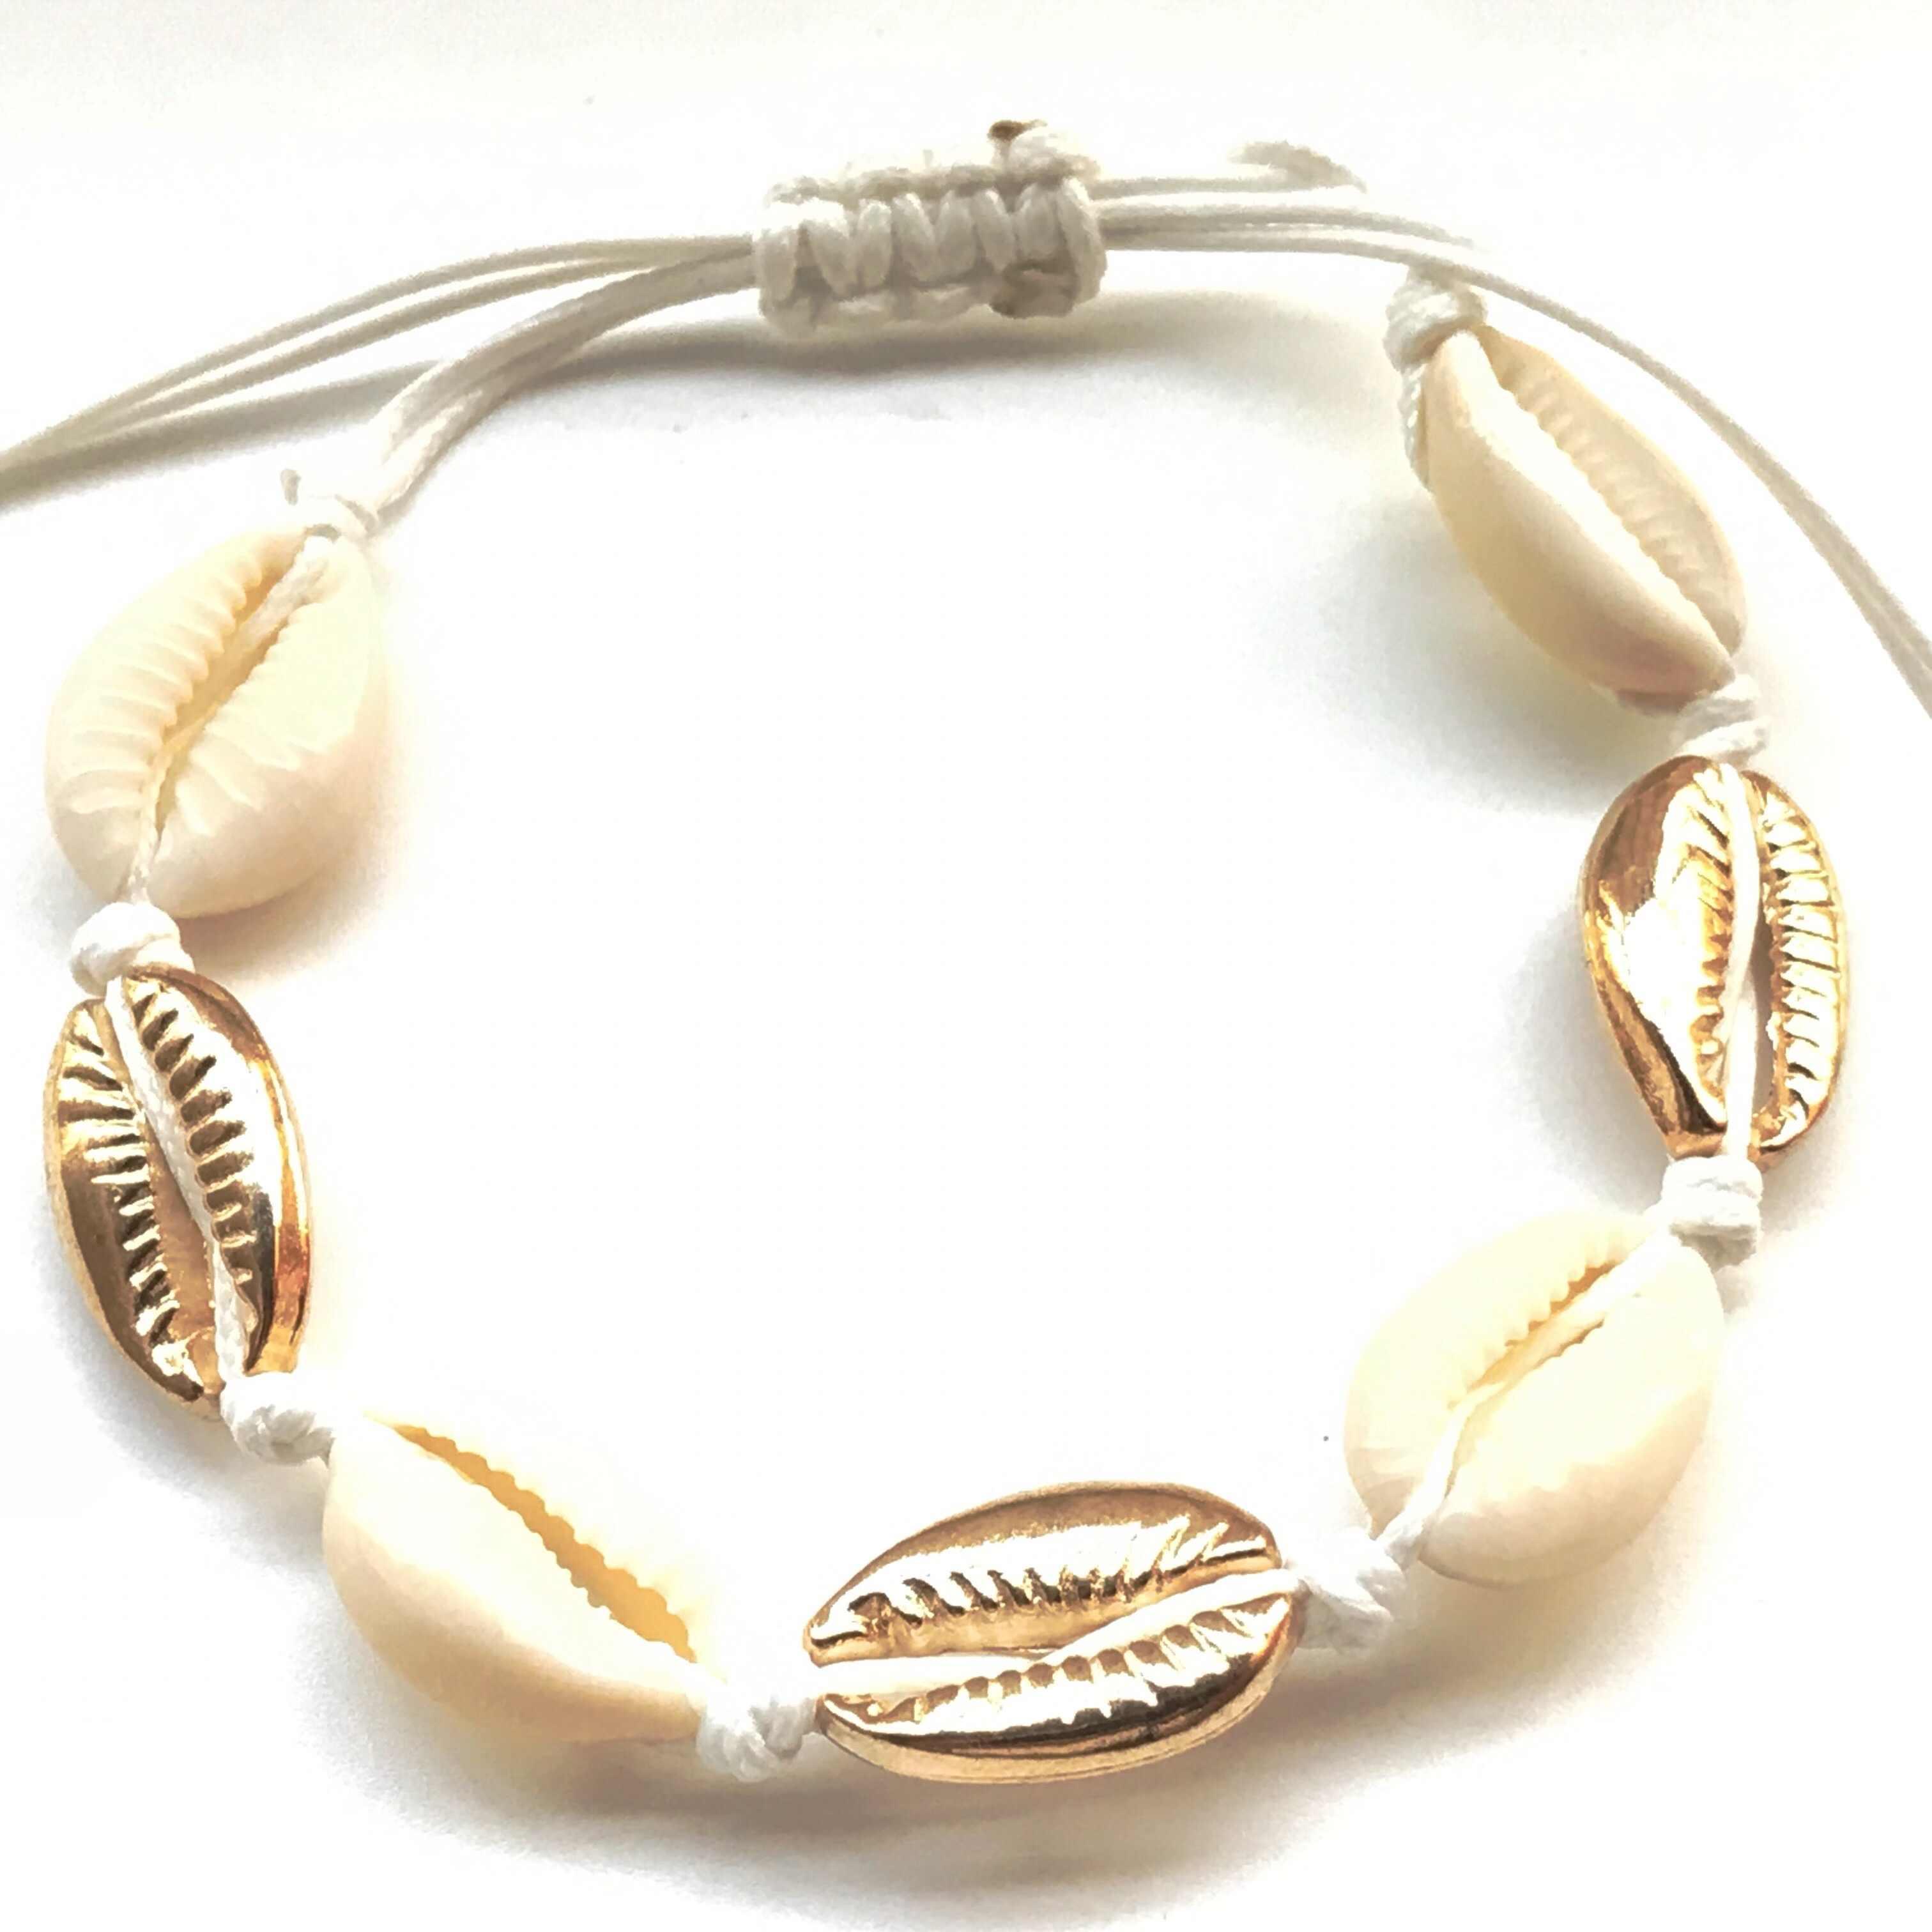 Hot Sale Handmade Natural Seashell Hand Knit Bracelet Shells Bracelets Women Accessories Beaded Strand Bracelet